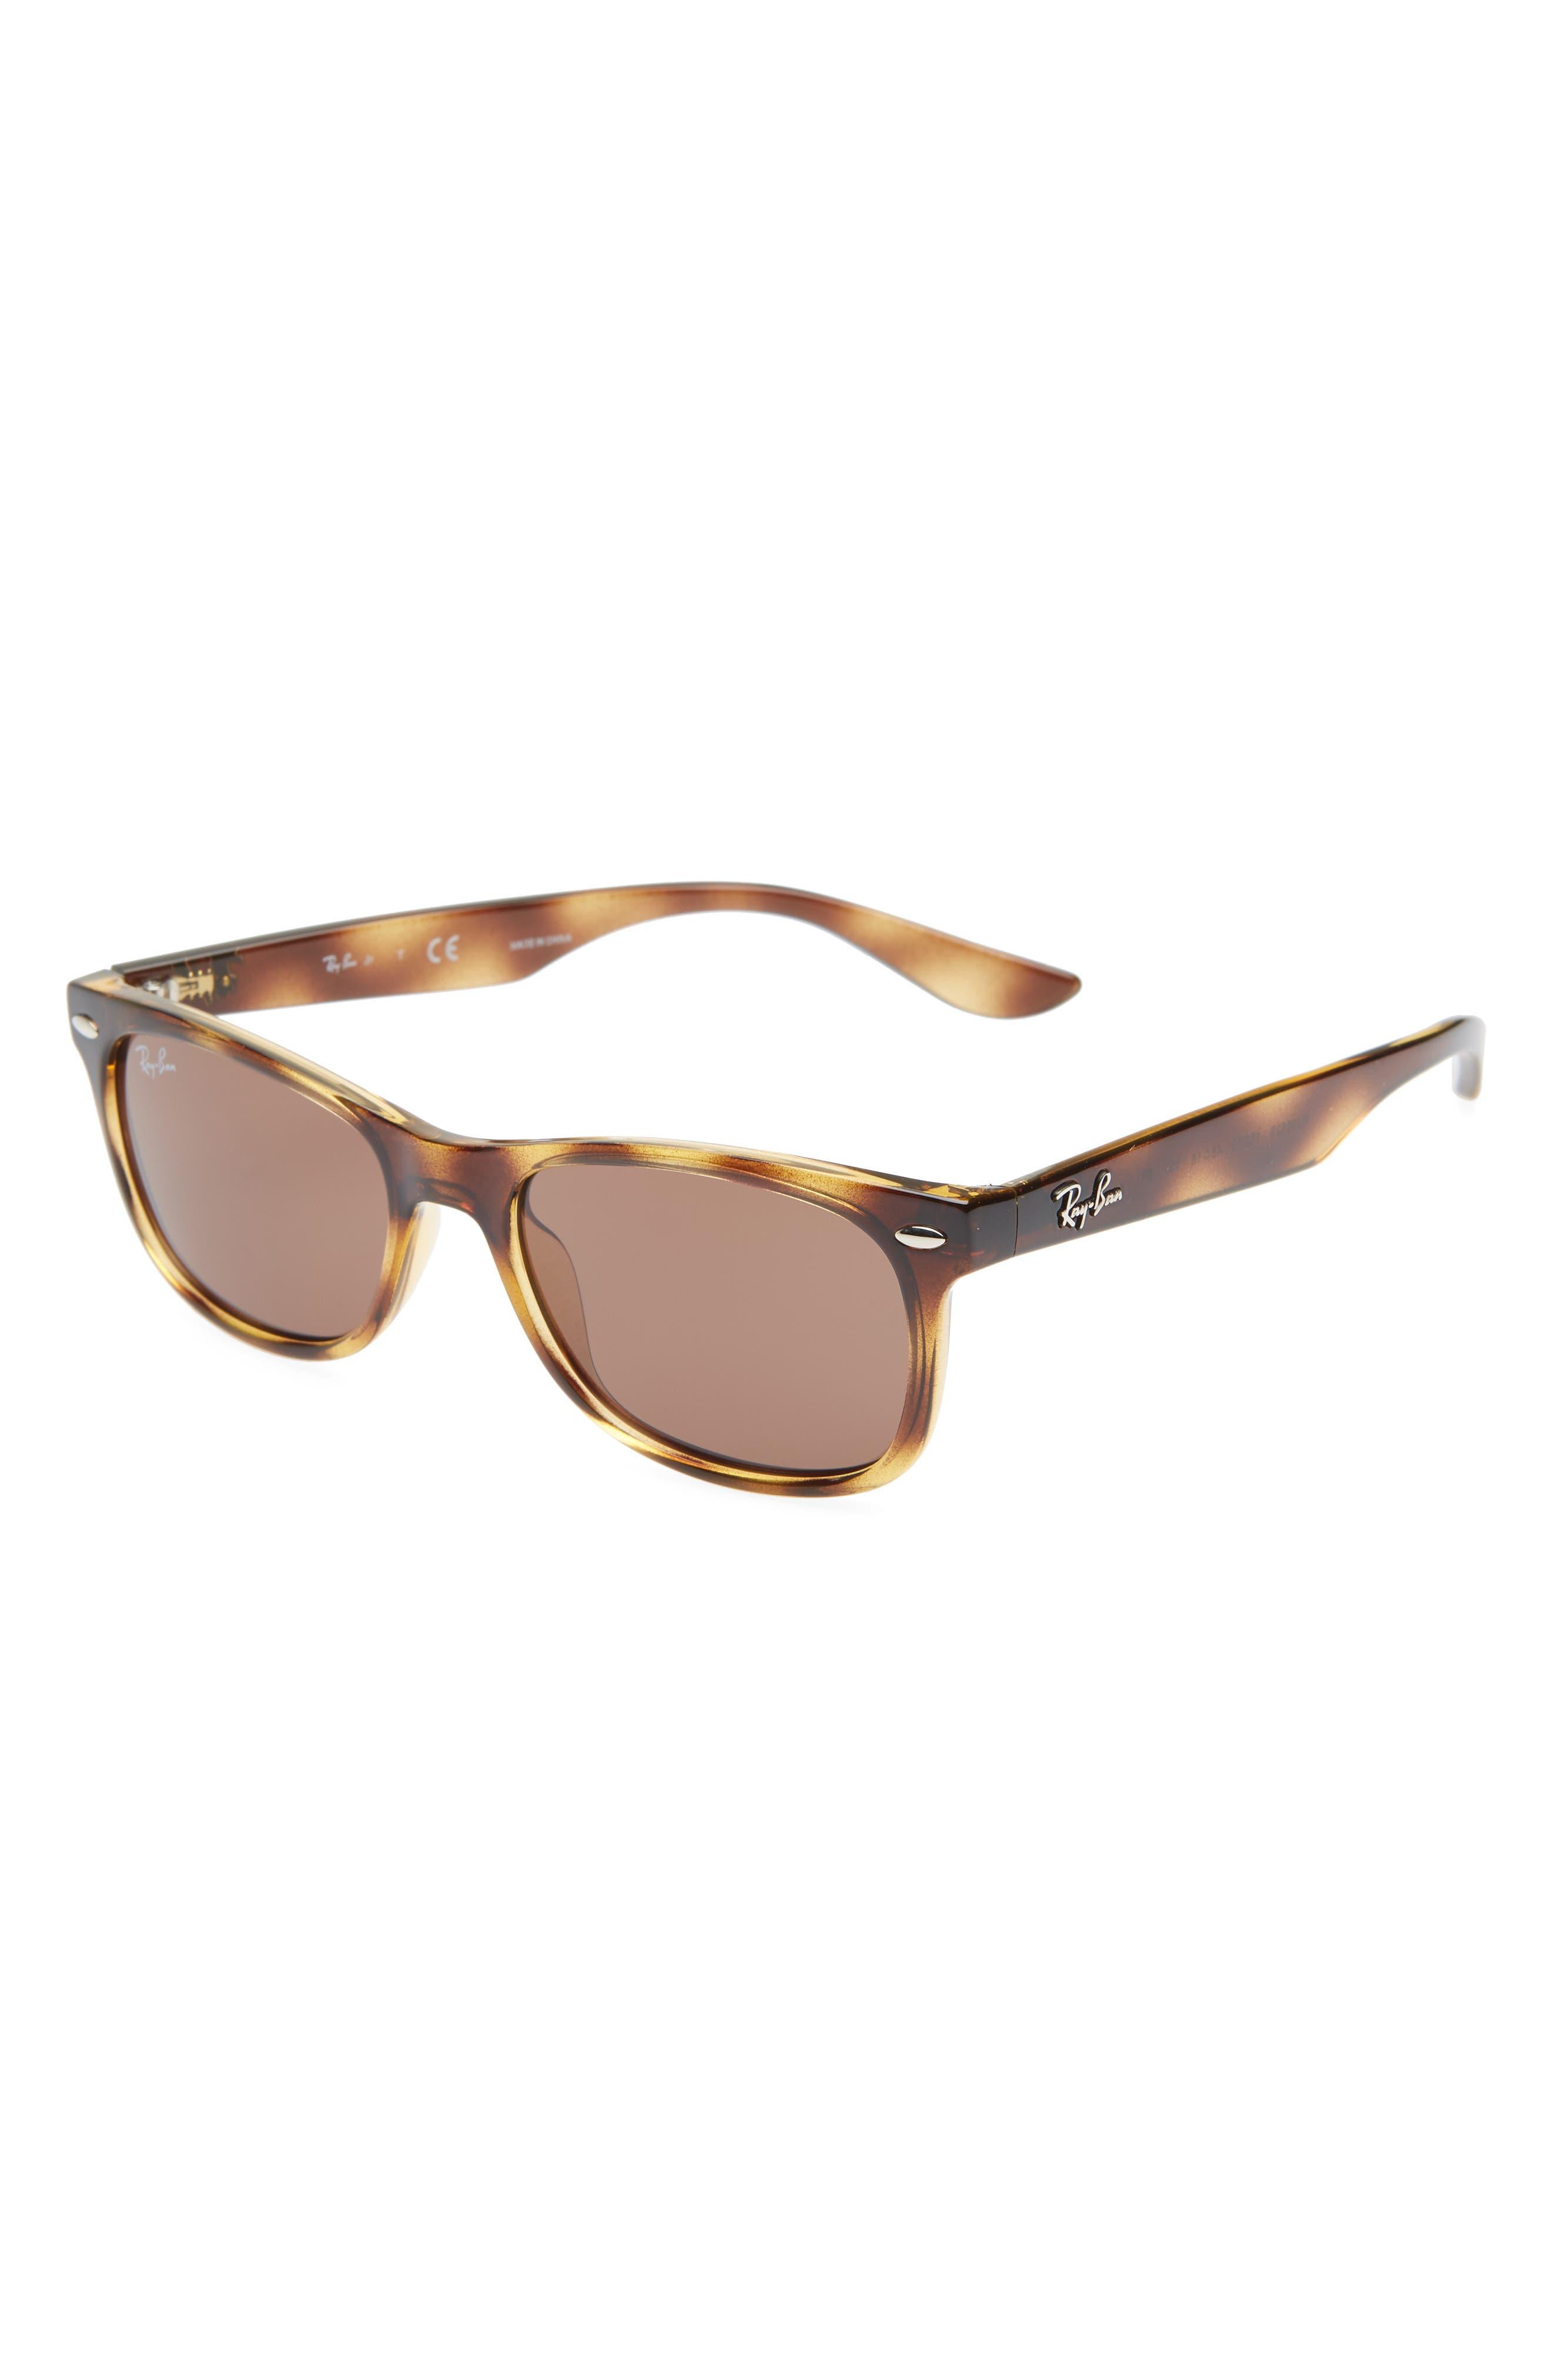 Ray-Ban Junior 4m Wayfarer Sunglasses - Havana Solid